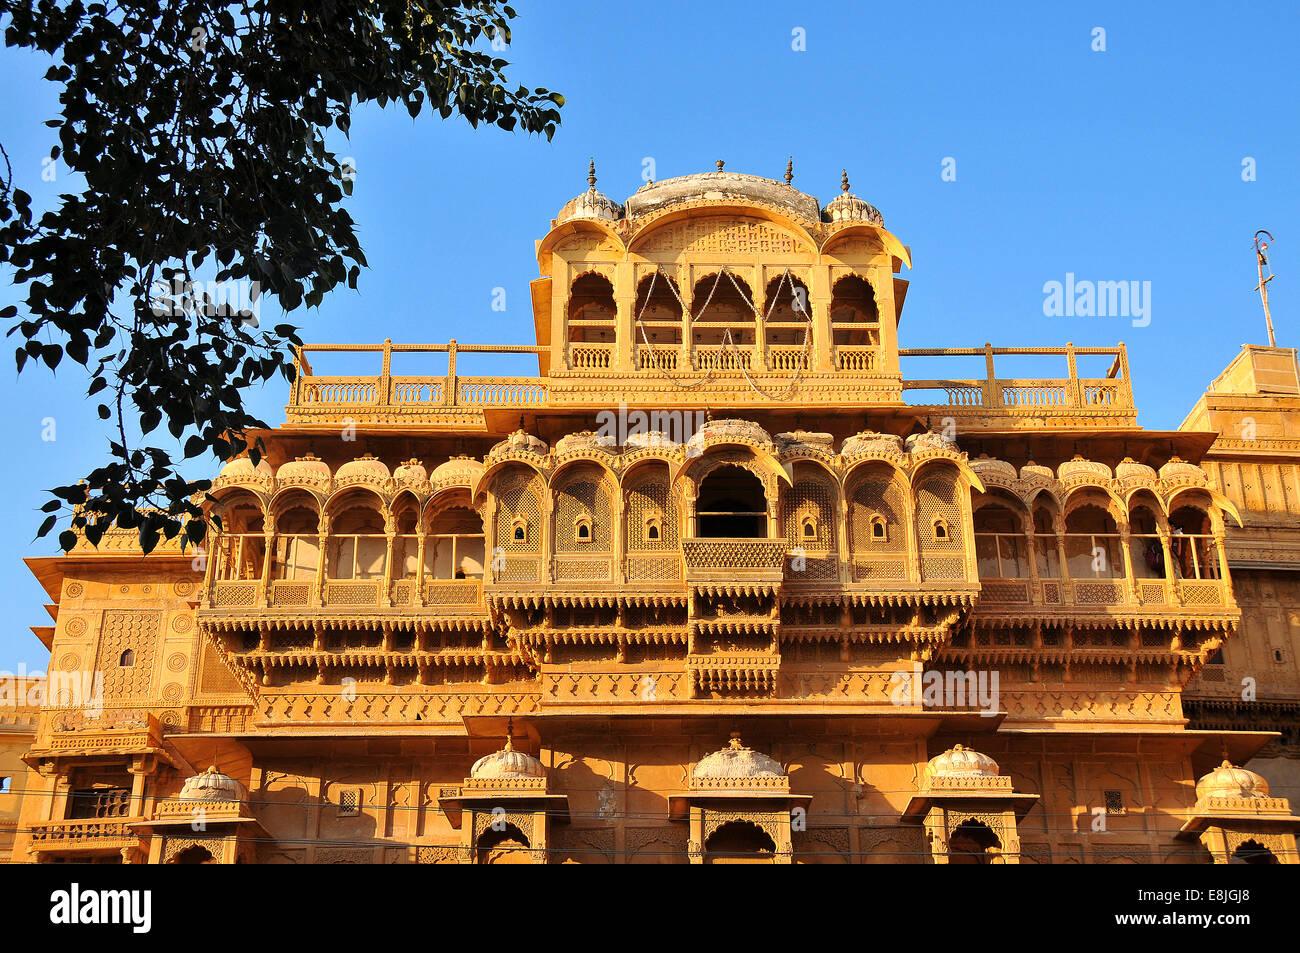 Jaisalmer Raj Mahal. Royal Palace. - Stock Image